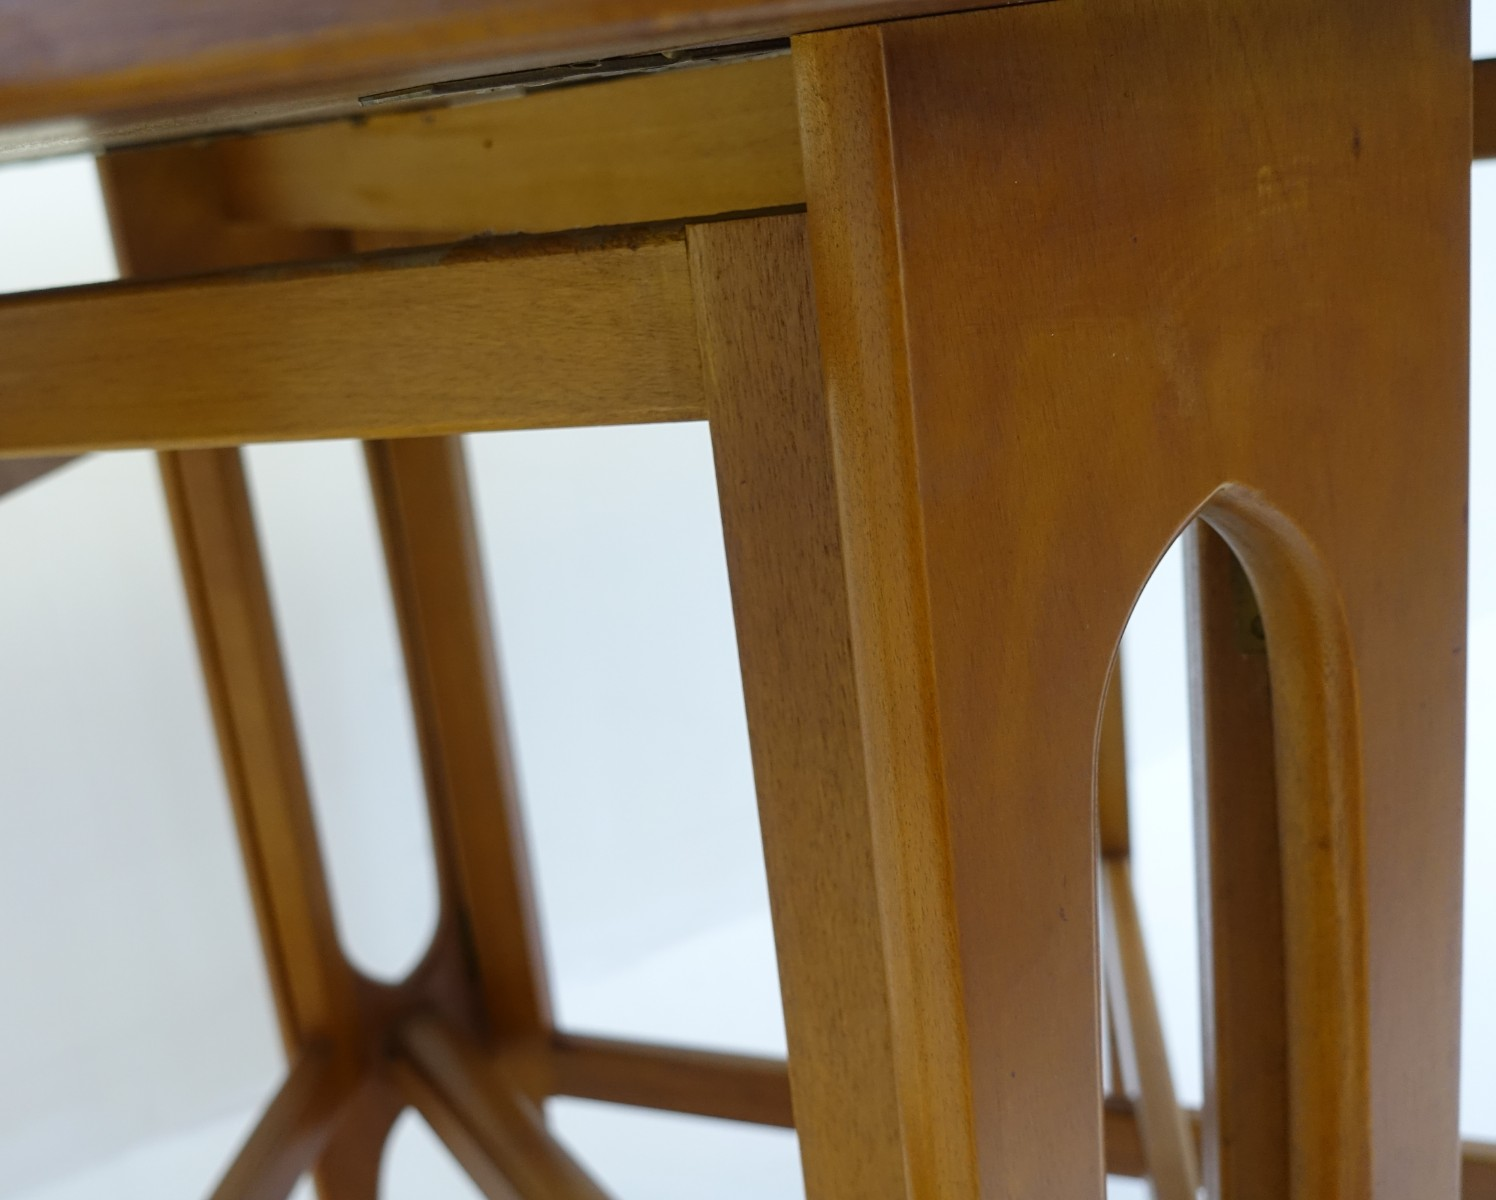 Wondrous Teak And Beech Dining Table By Bendt Winge For Klepp Mobel Customarchery Wood Chair Design Ideas Customarcherynet